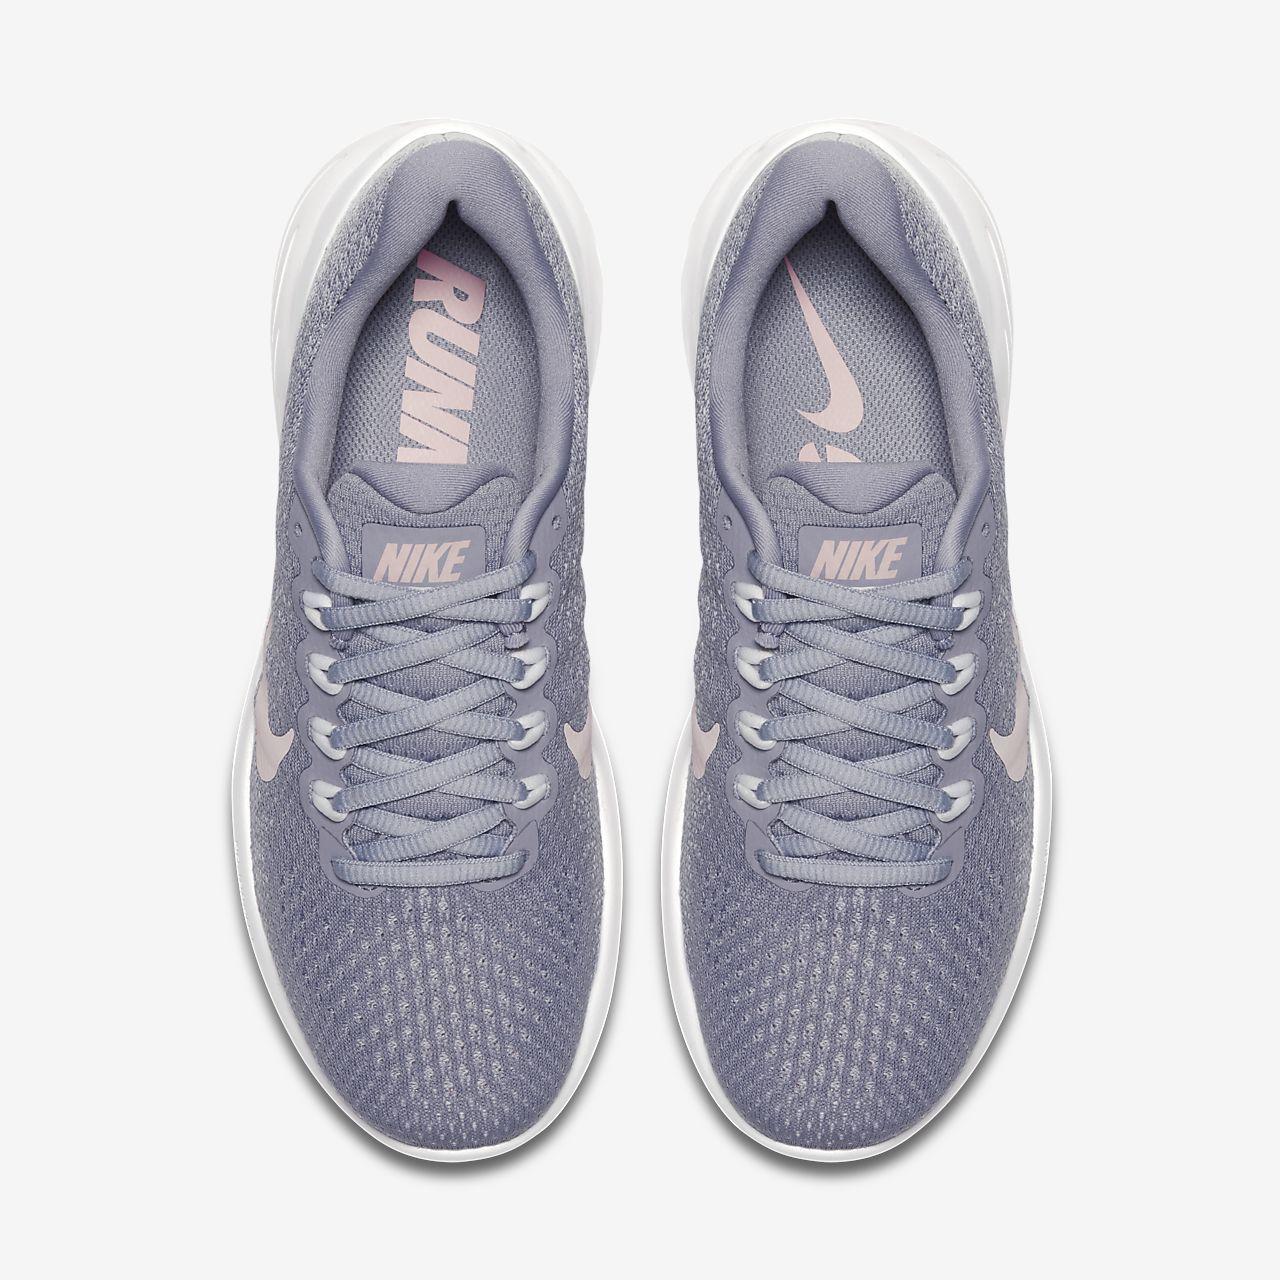 Nike LunarGlide 9 Damen Laufschuh | Laufschuhe, Schuhe damen